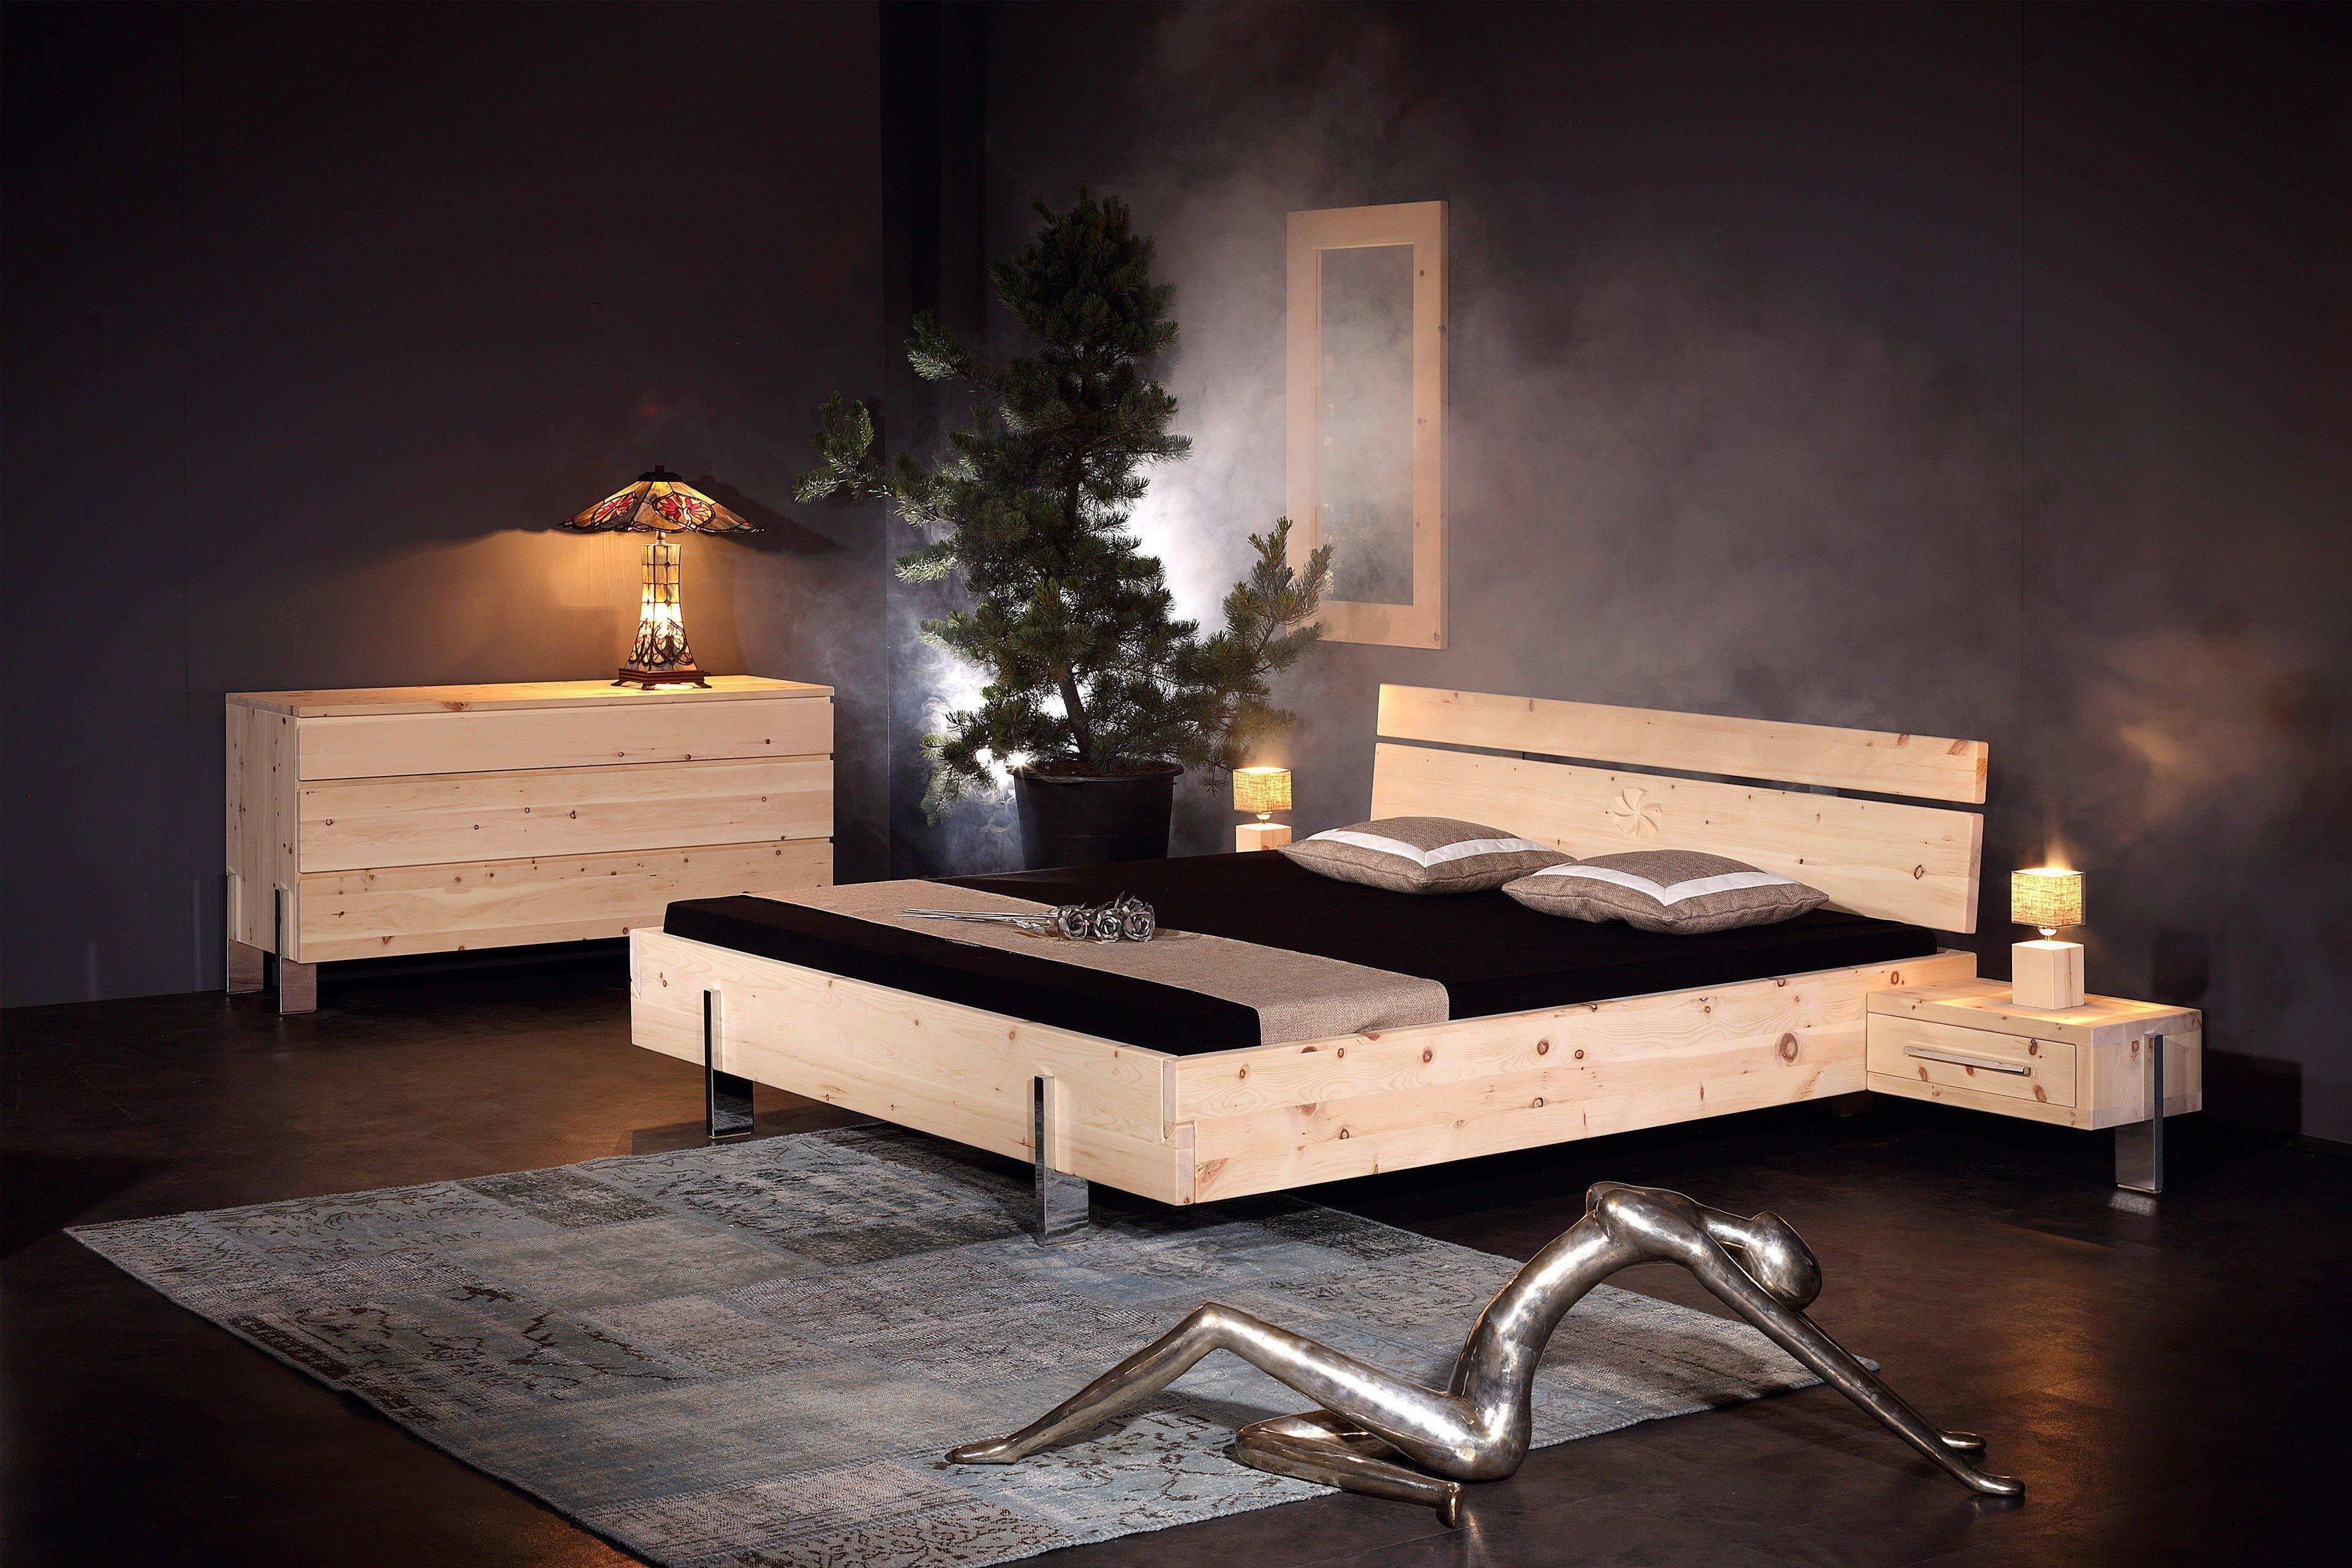 sprenger parpan holzbett zirbenholz versiegelt m bel letz ihr online shop. Black Bedroom Furniture Sets. Home Design Ideas